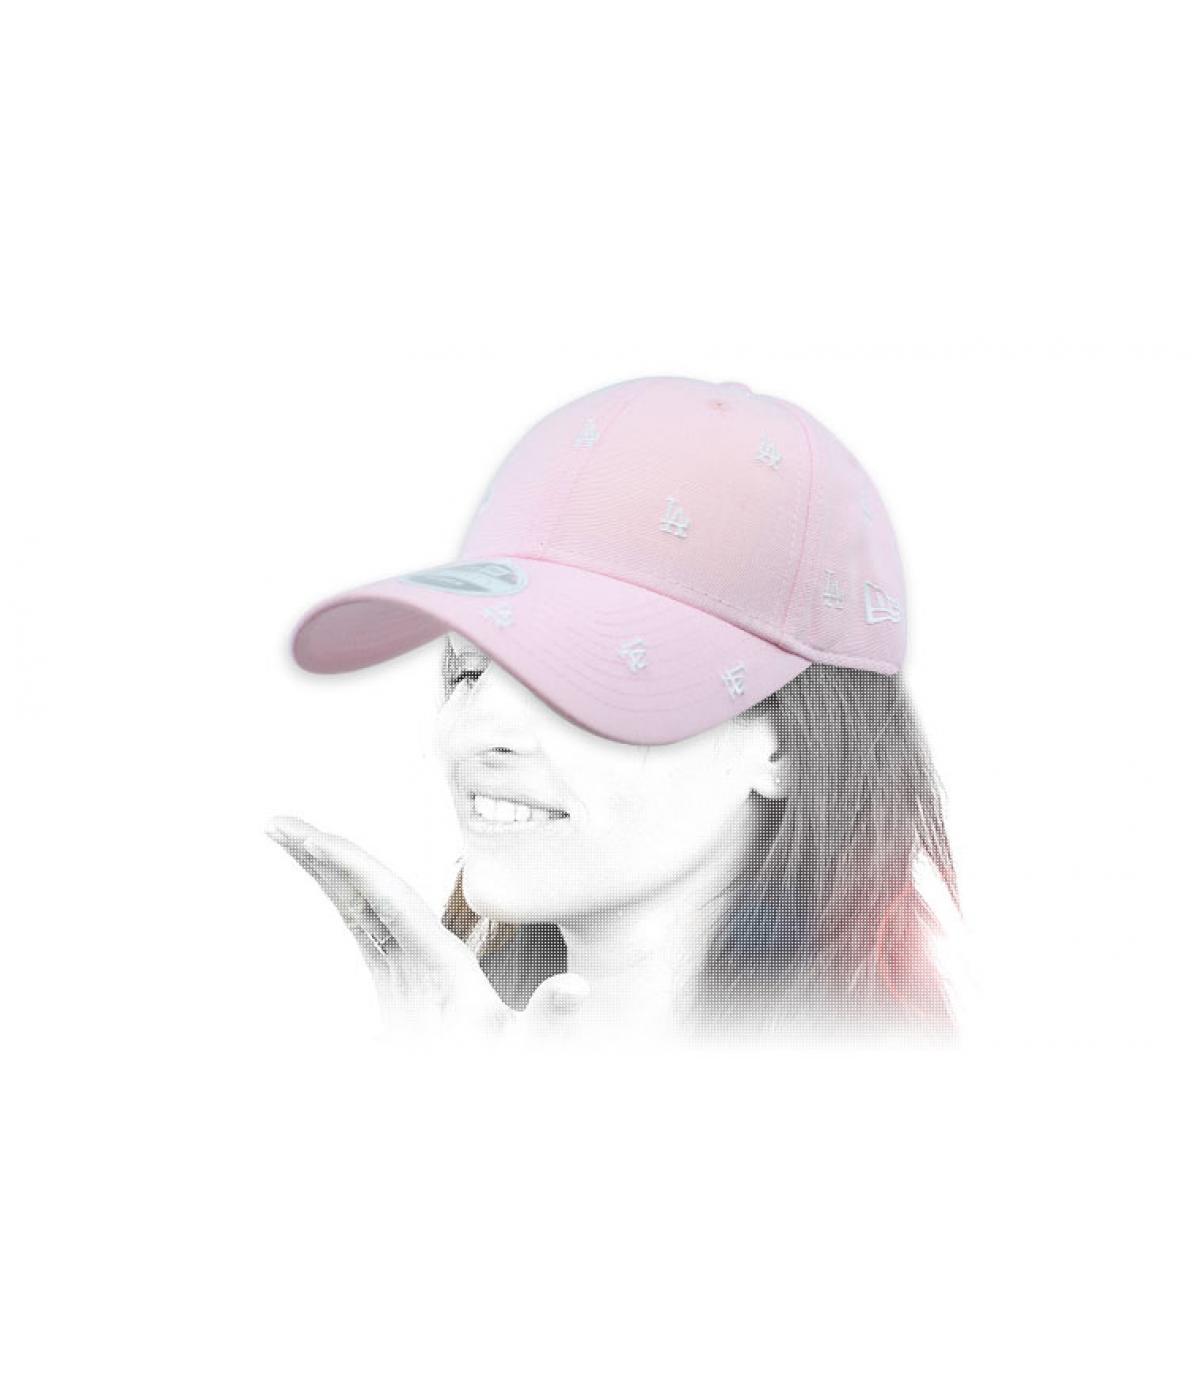 2718b008dfaa0 New Era Wmns Jersey 9Forty NY mint. 32€ - Indisponible. gorra mujer LA rosa  monograma